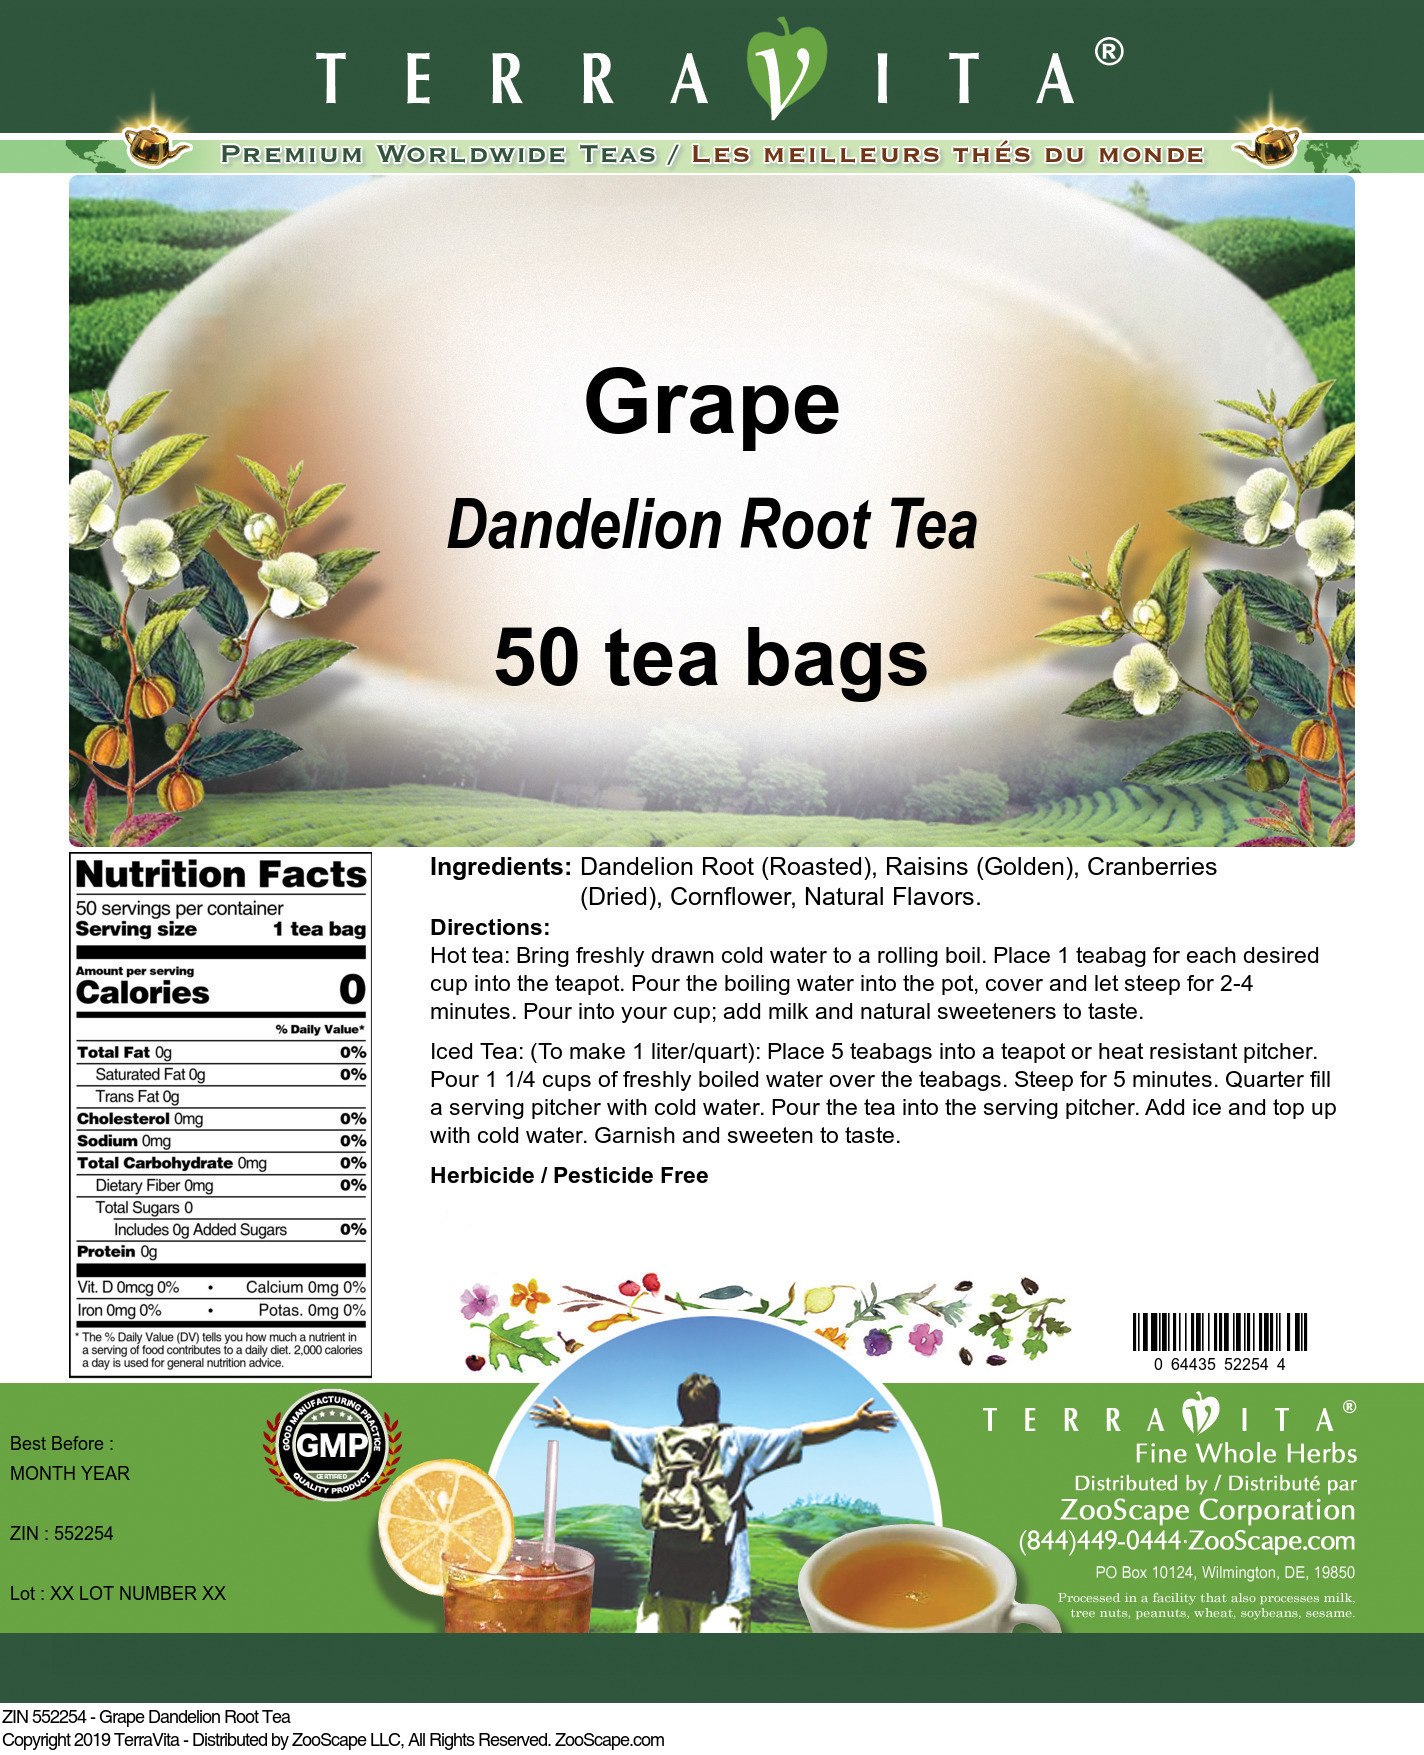 Grape Dandelion Root Tea